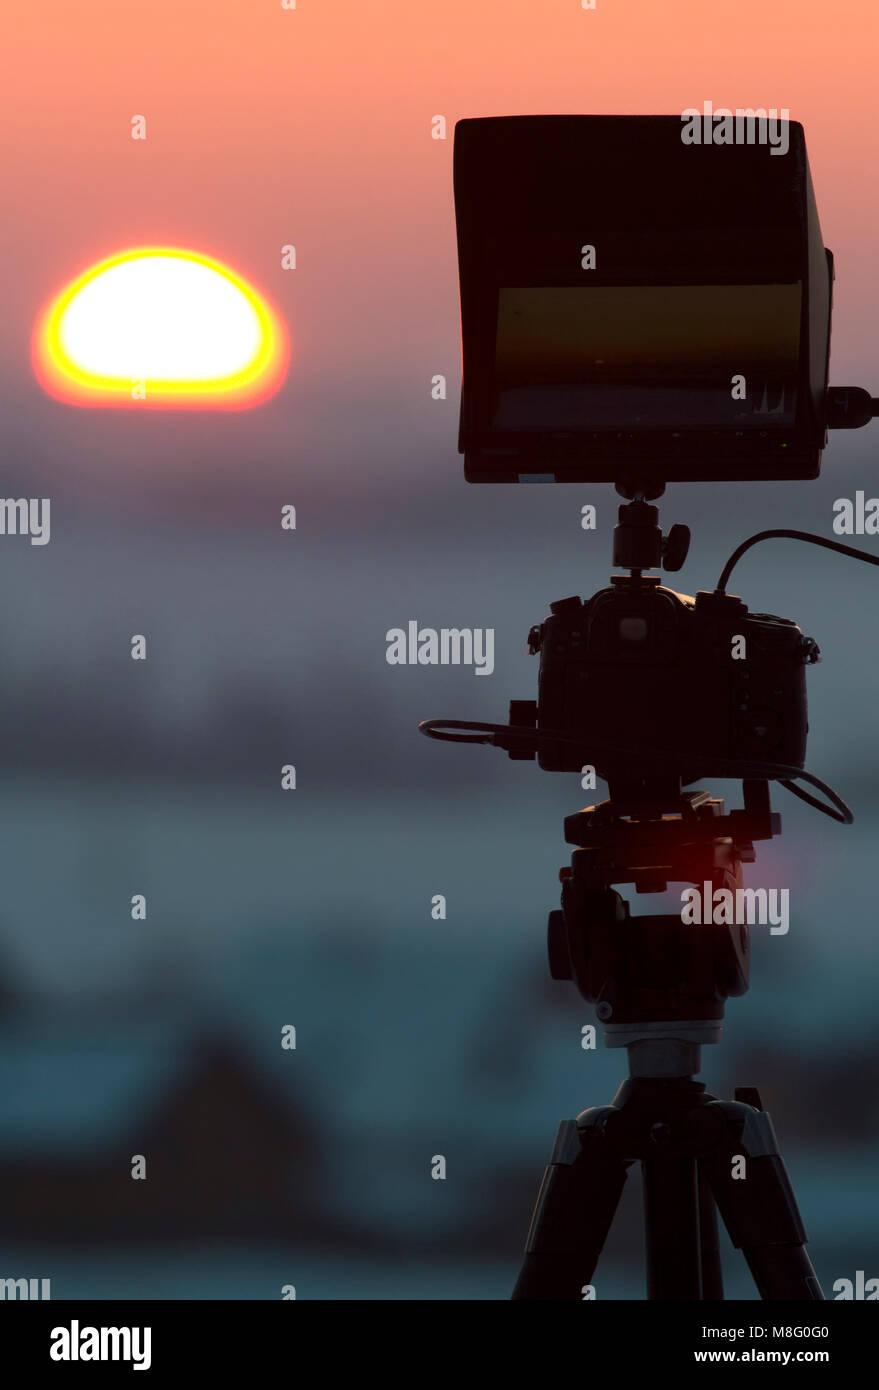 Silhouette of camera on tripod shooting beautiful winter sunrise - Stock Image